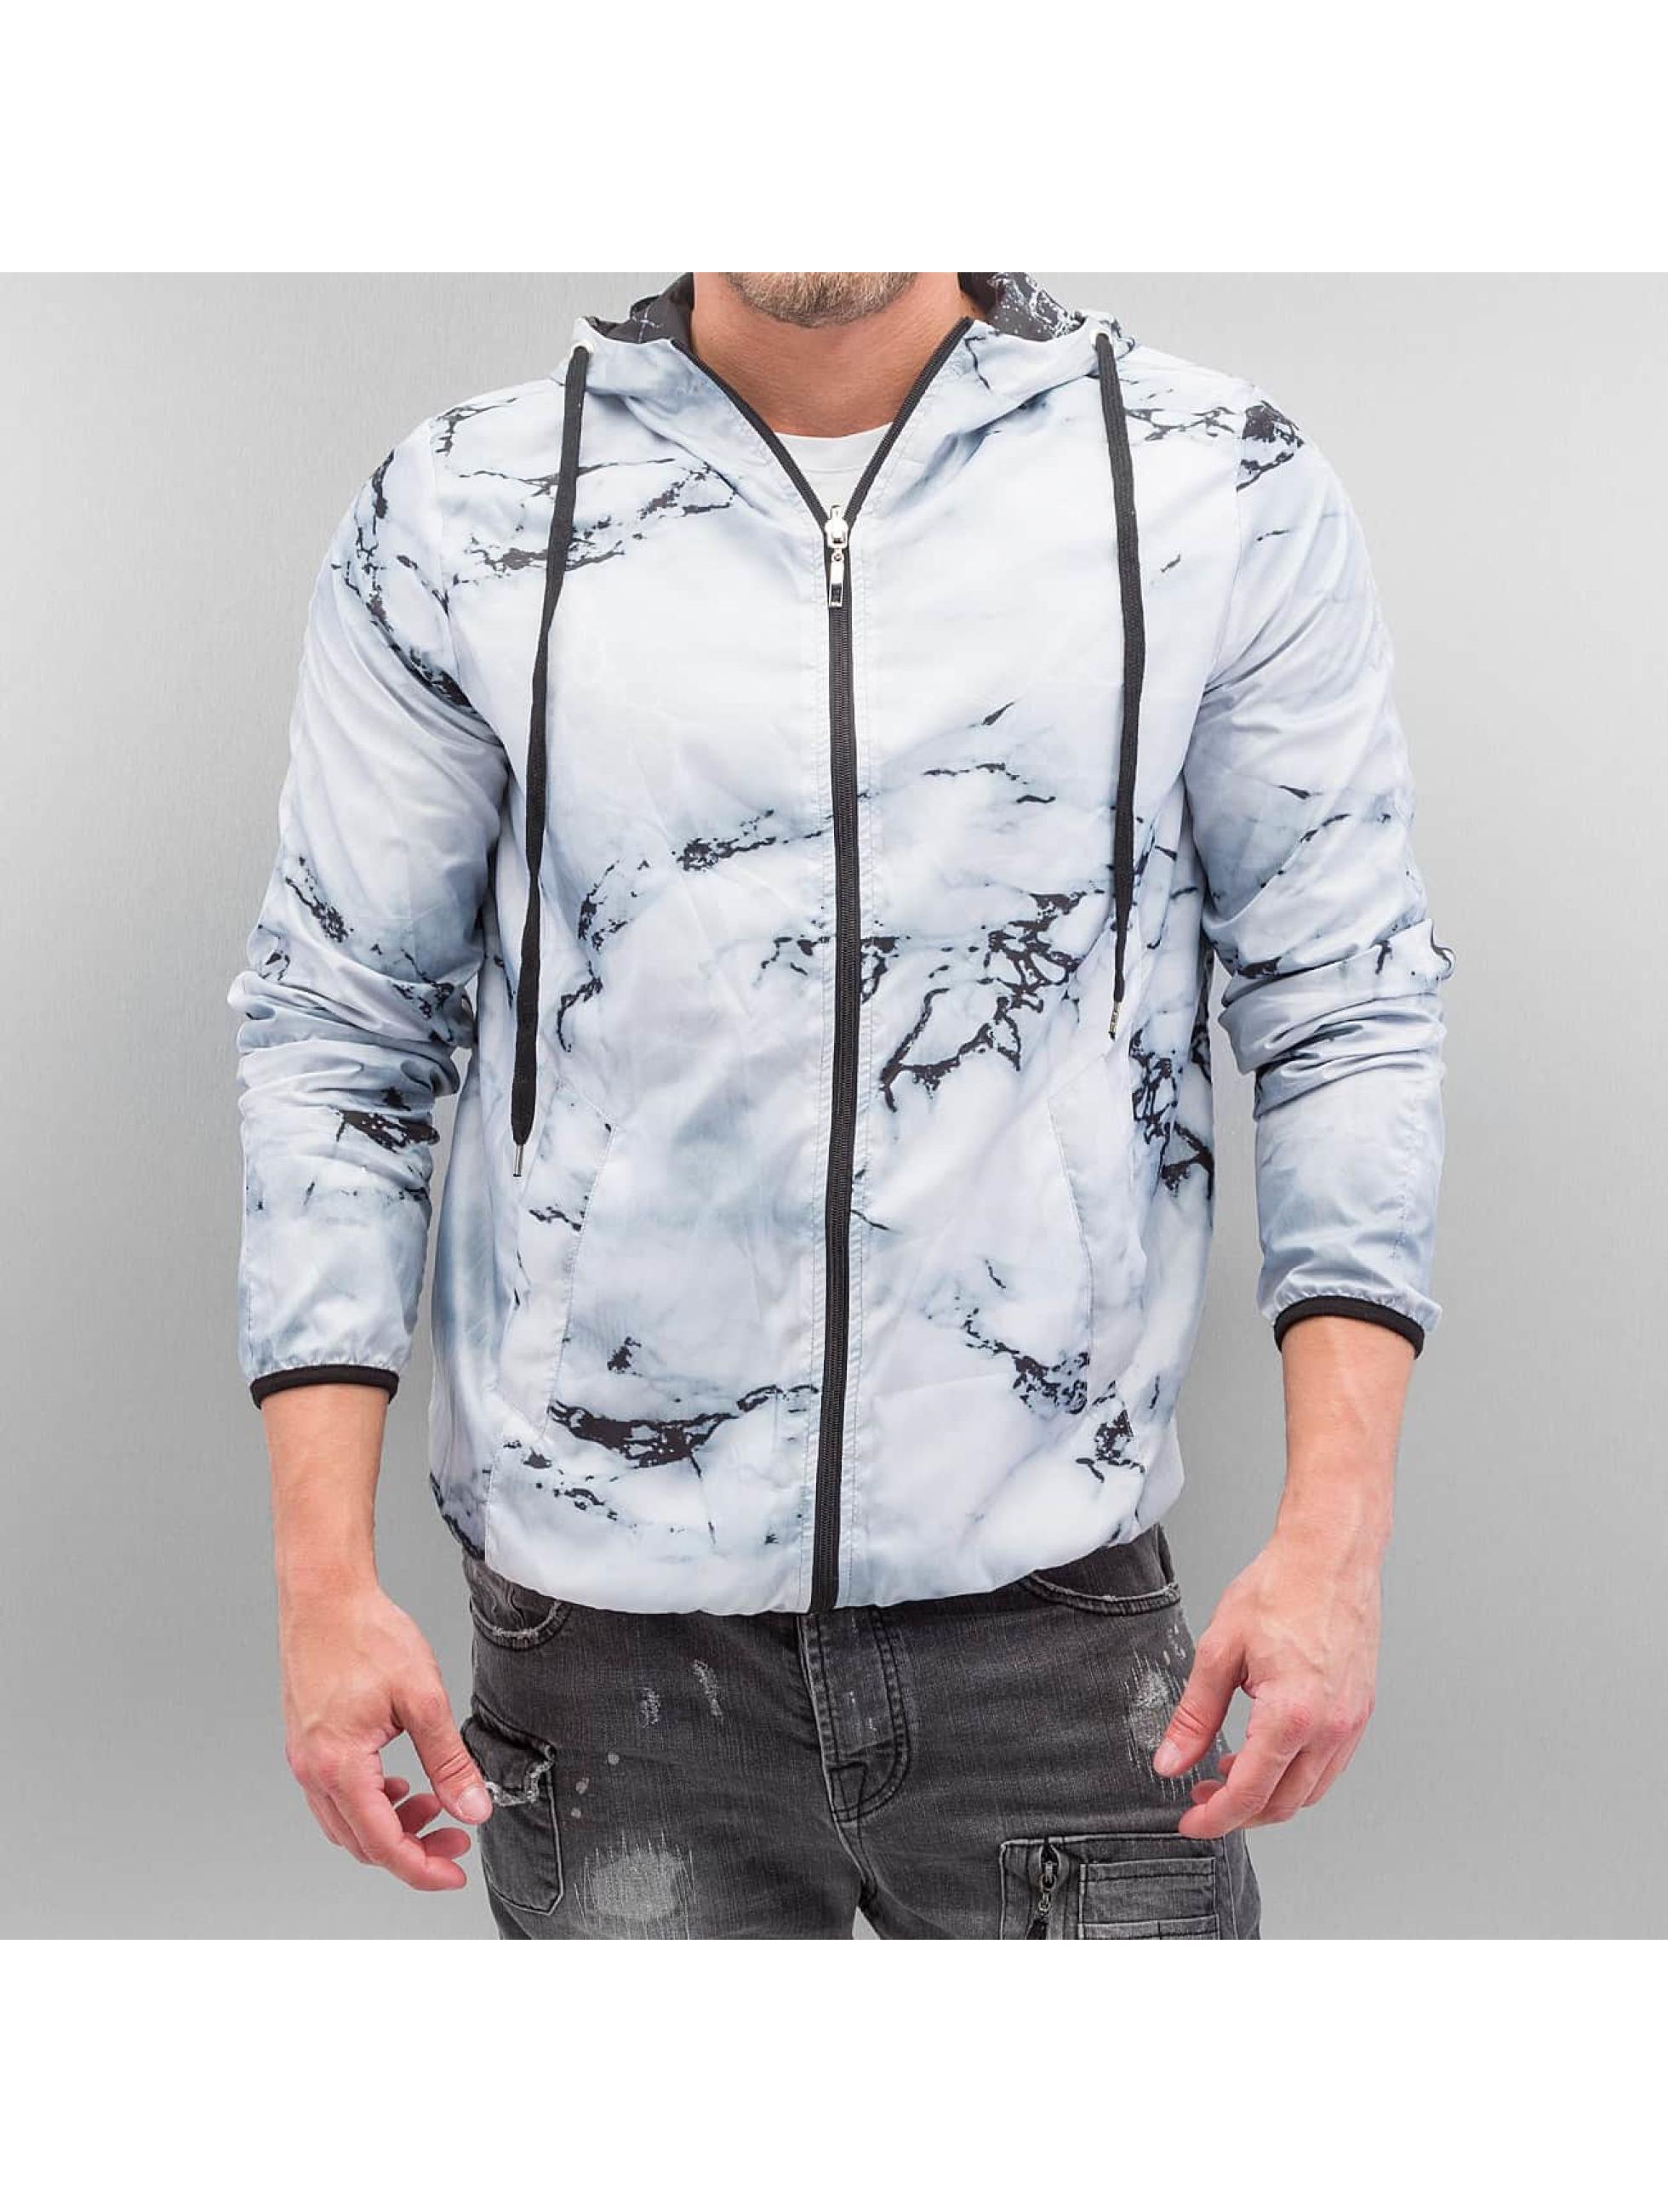 VSCT Clubwear Prechodné vetrovky Marble 2in1 Reversible èierna